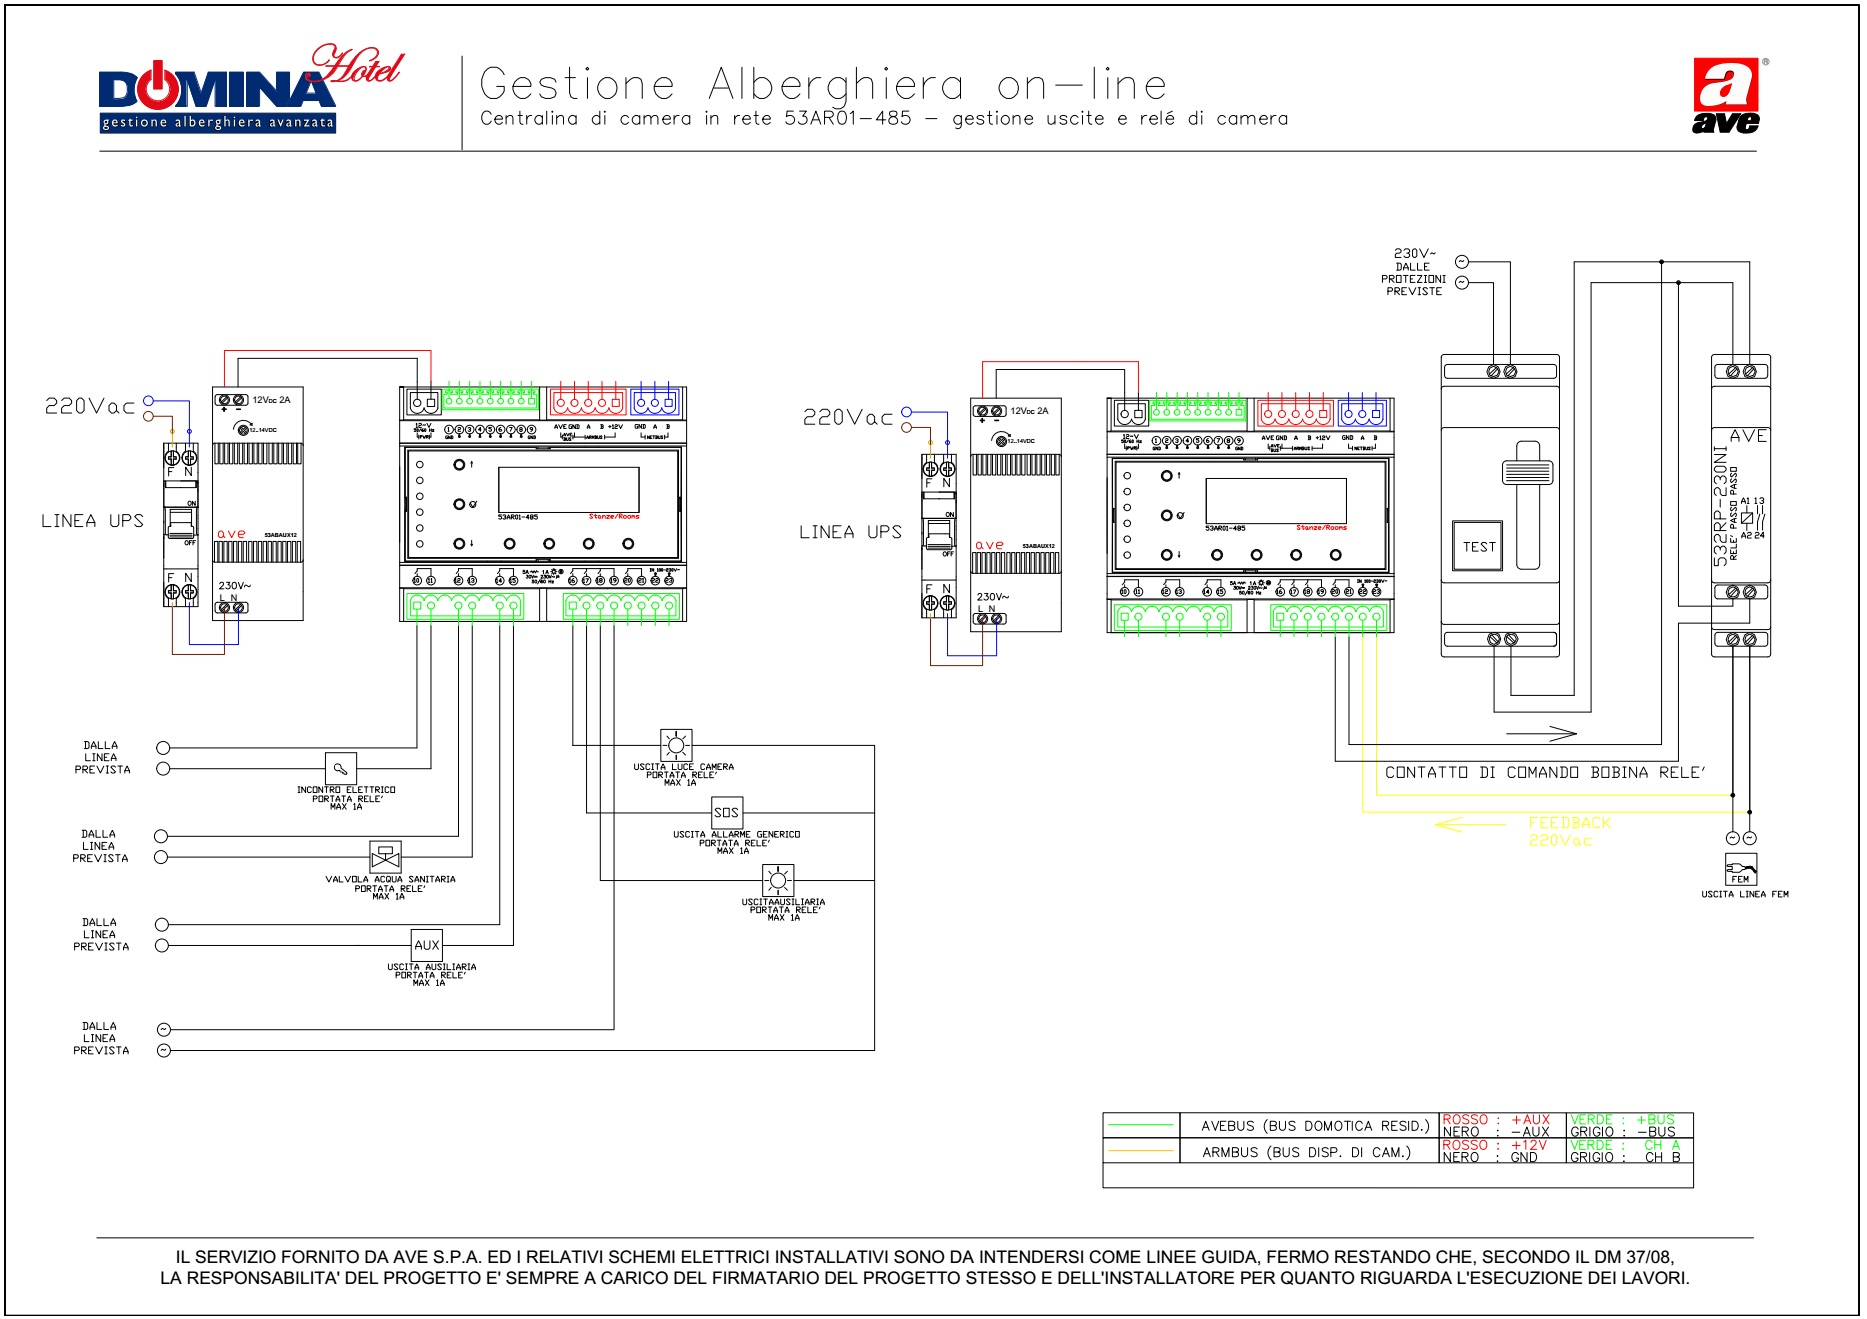 Gestione Alberghiera on-line - gestione uscite centralina 53AR01-485